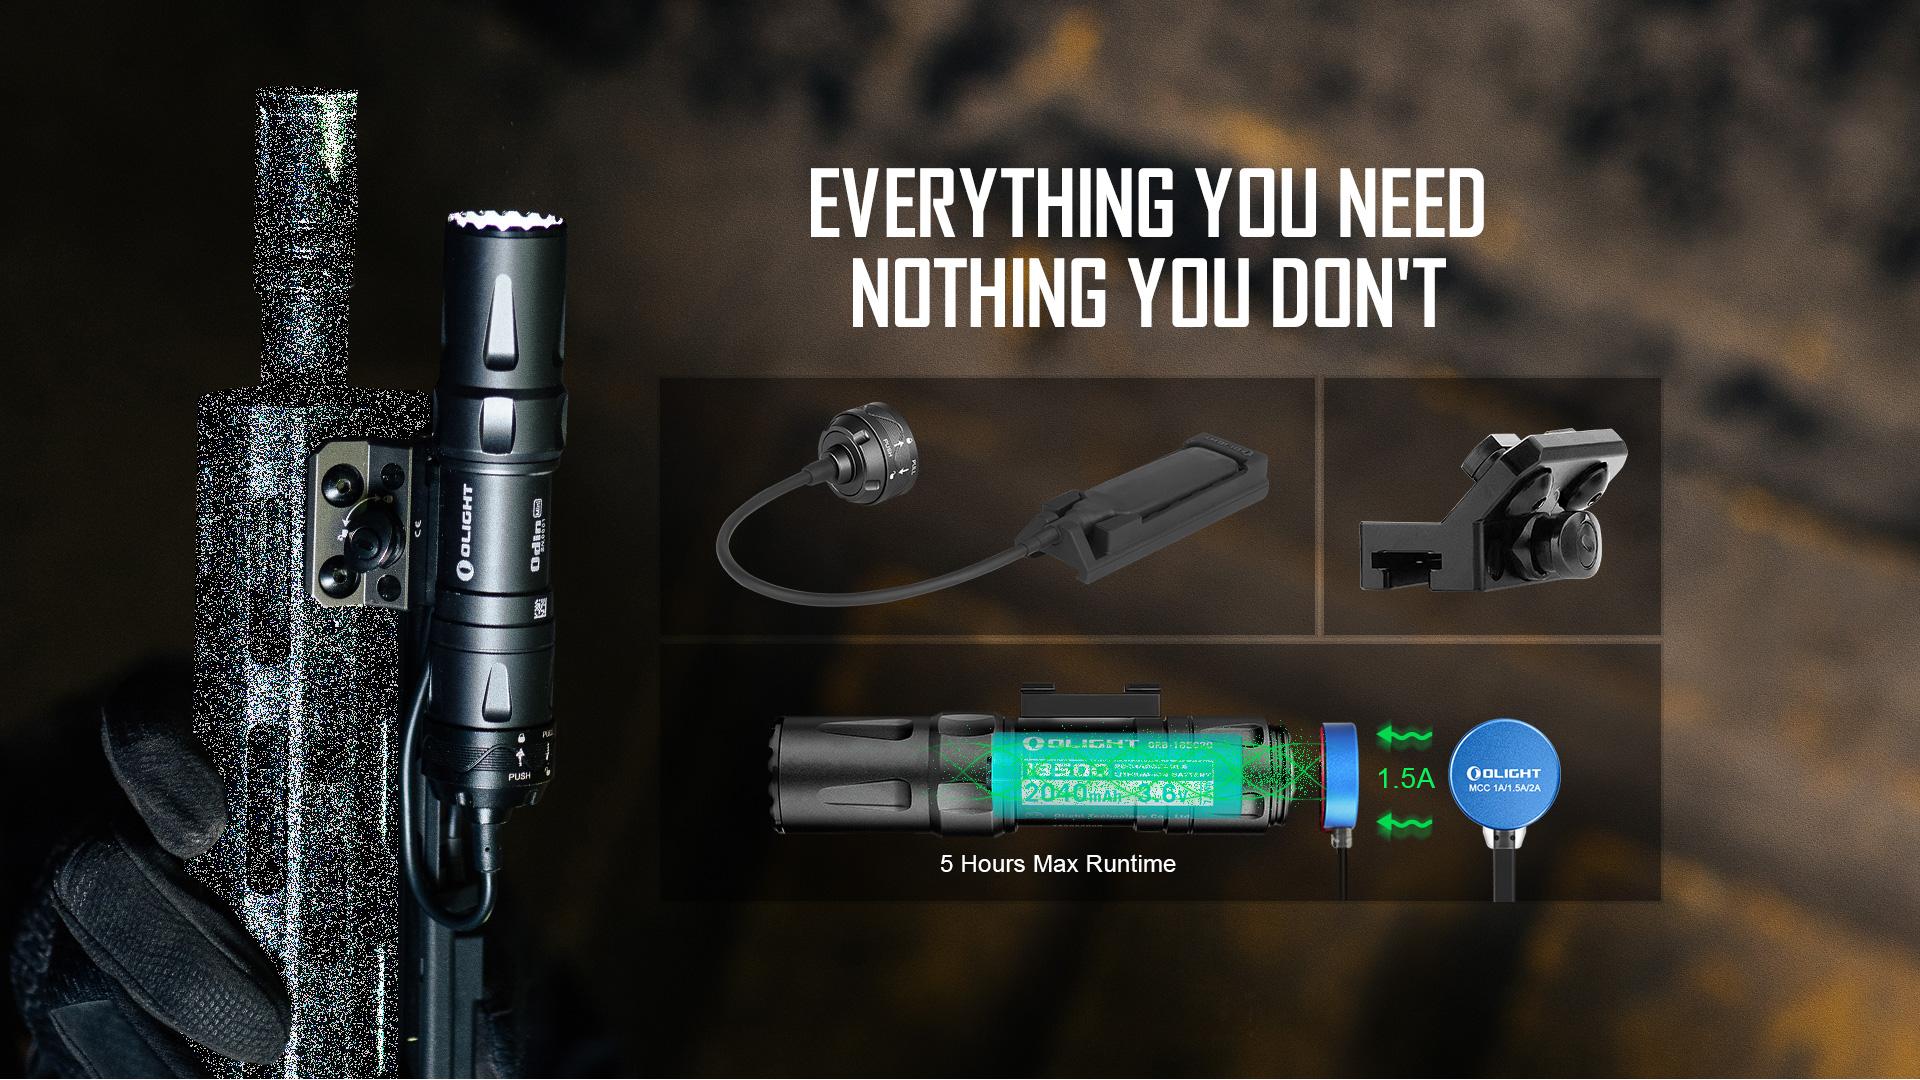 Odin Mini rechargeable tactical LED flashlight